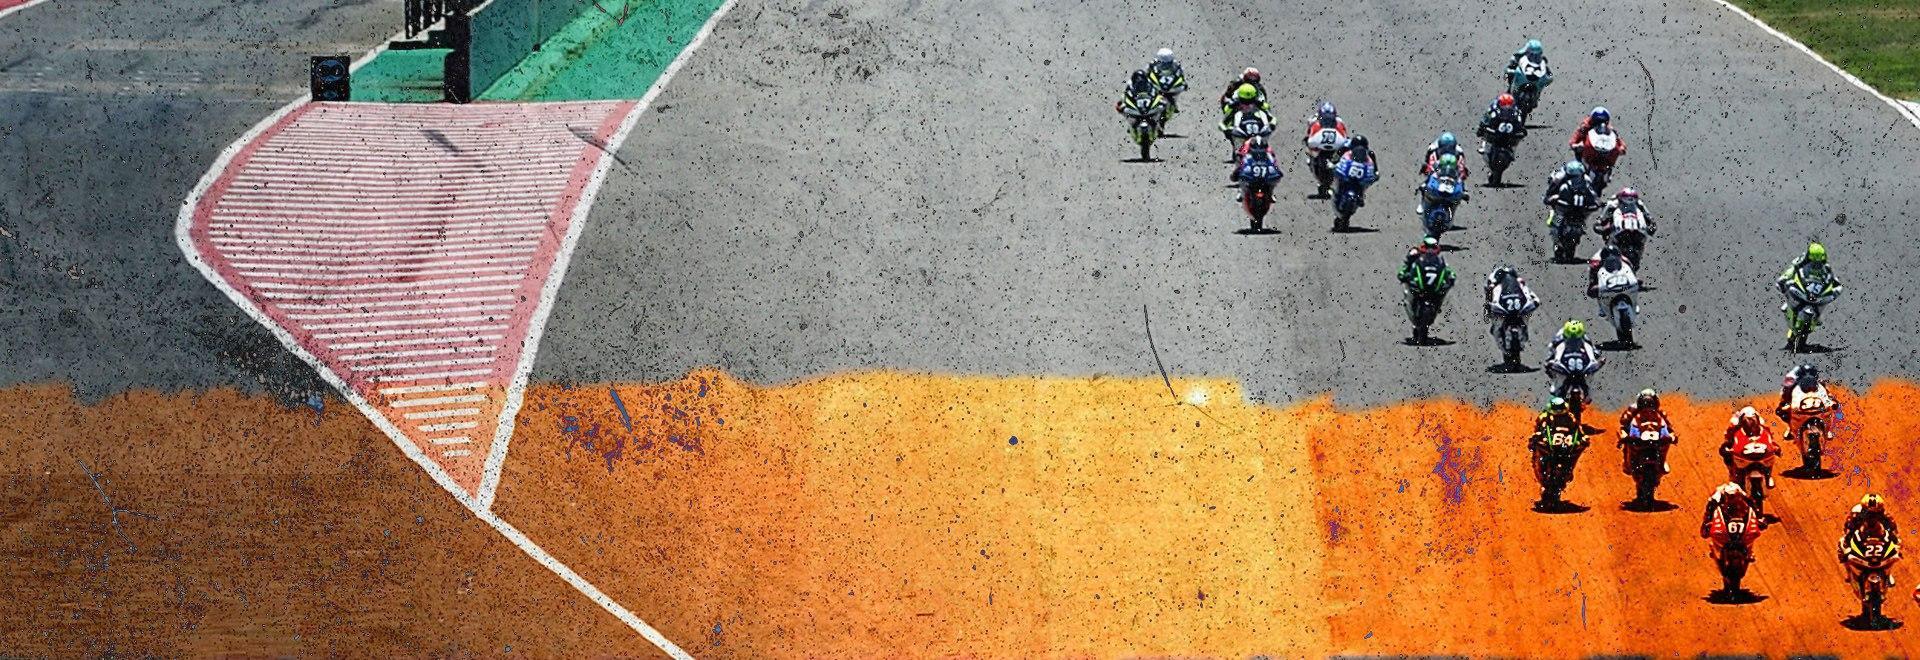 GP Estoril: Moto3. Race 1